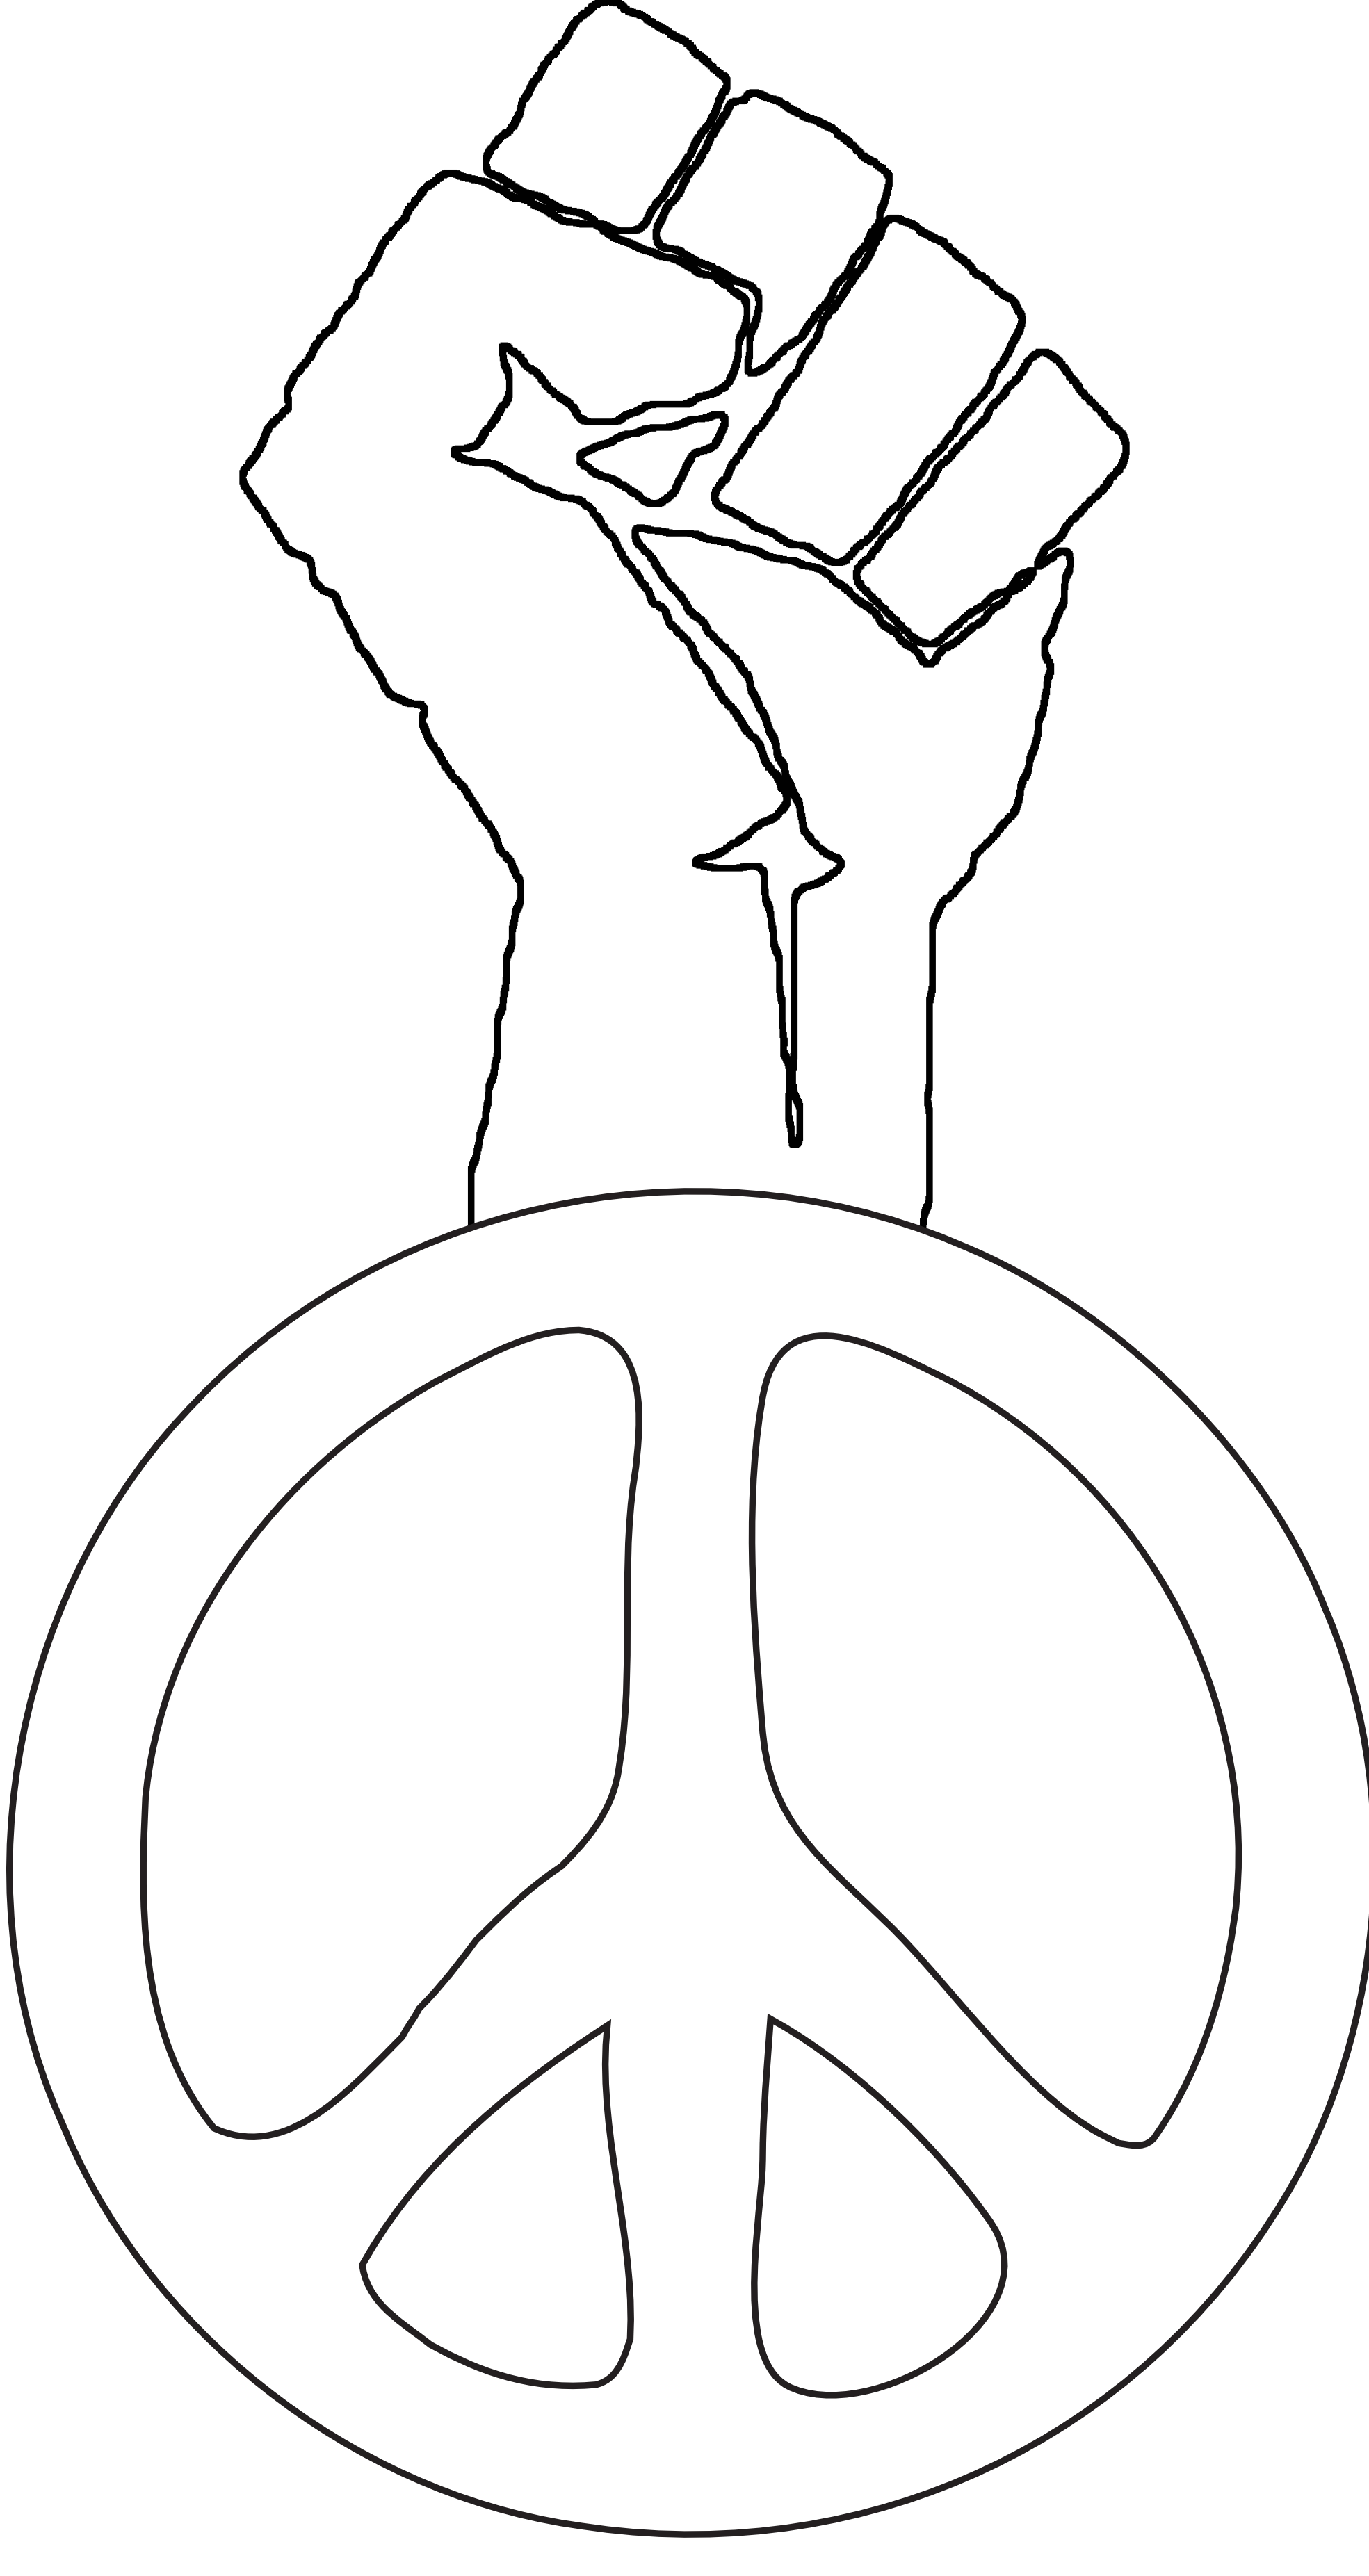 Drawn peace sign groovy Fist Groovy Fist Peace Fight